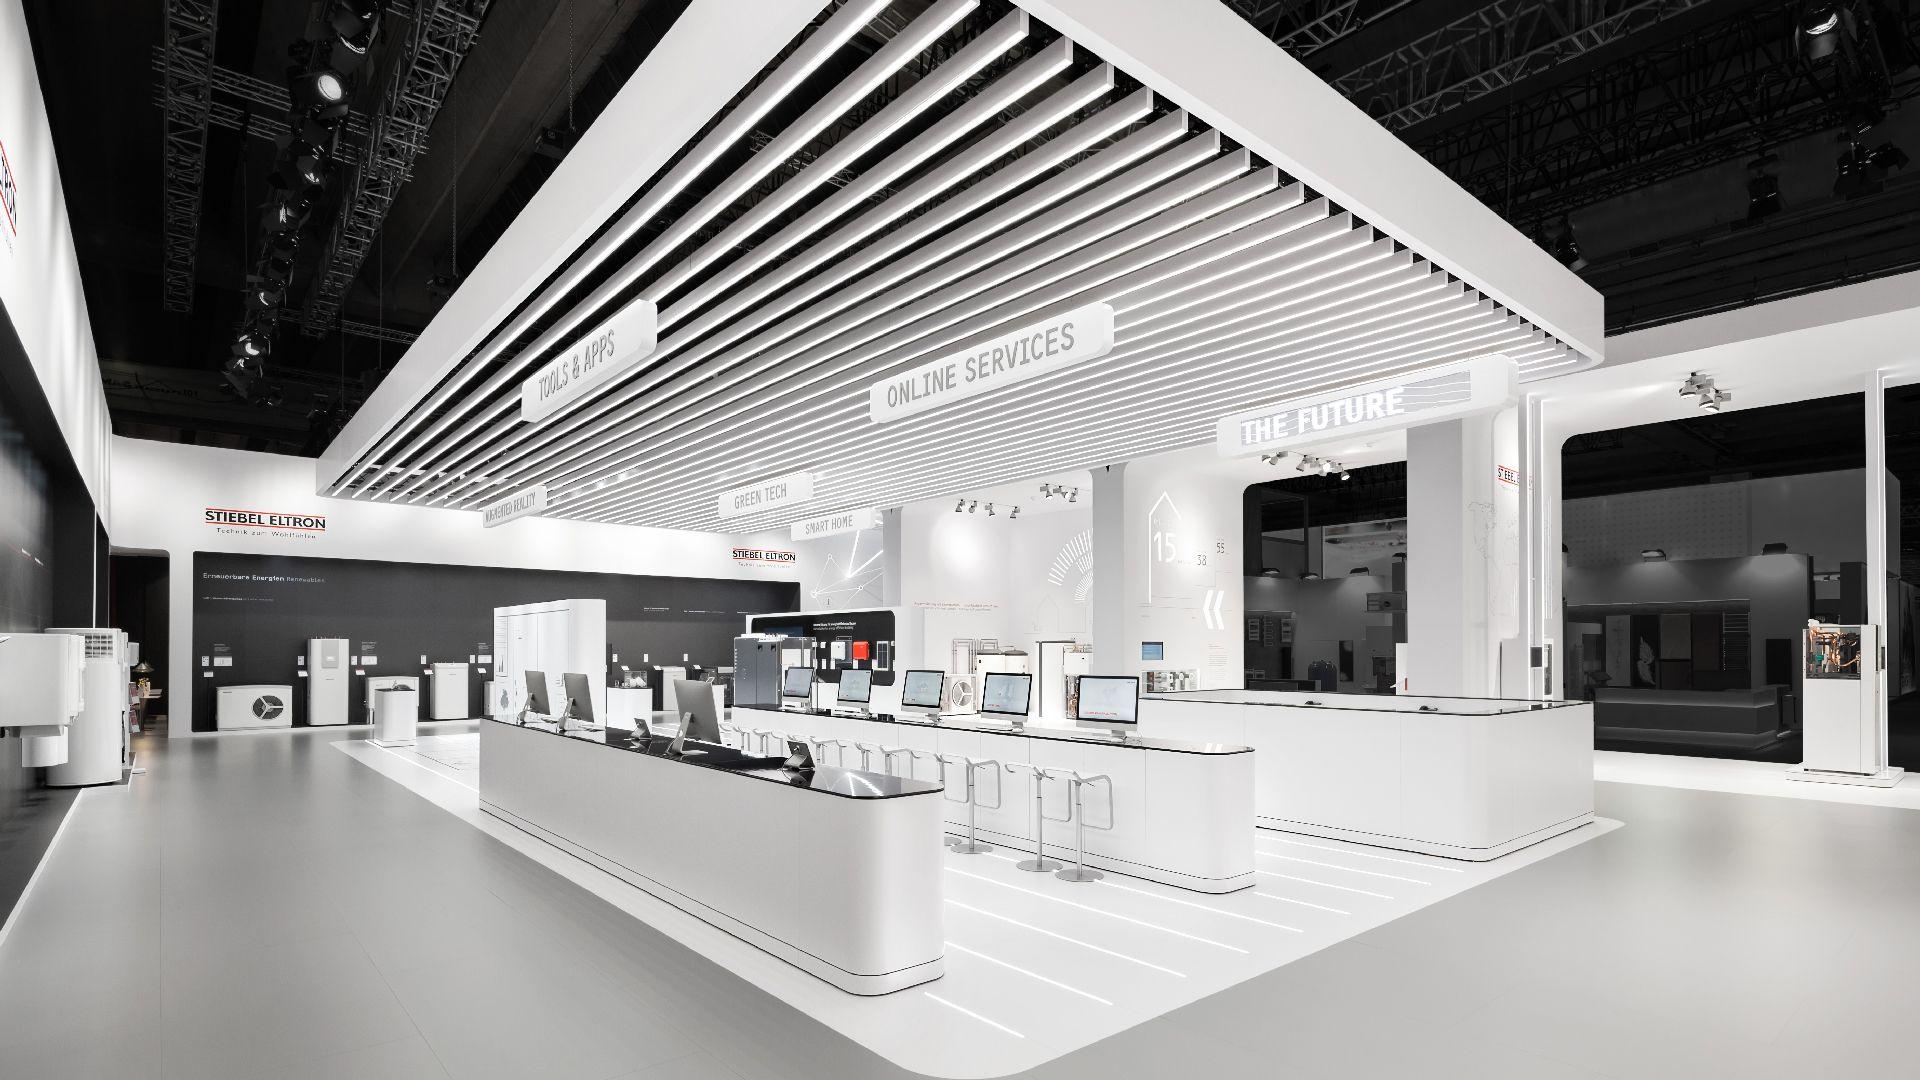 Willkommen Zukunft Messe Projekte D Art Design Gruppe Messebau Messestand Design Messe